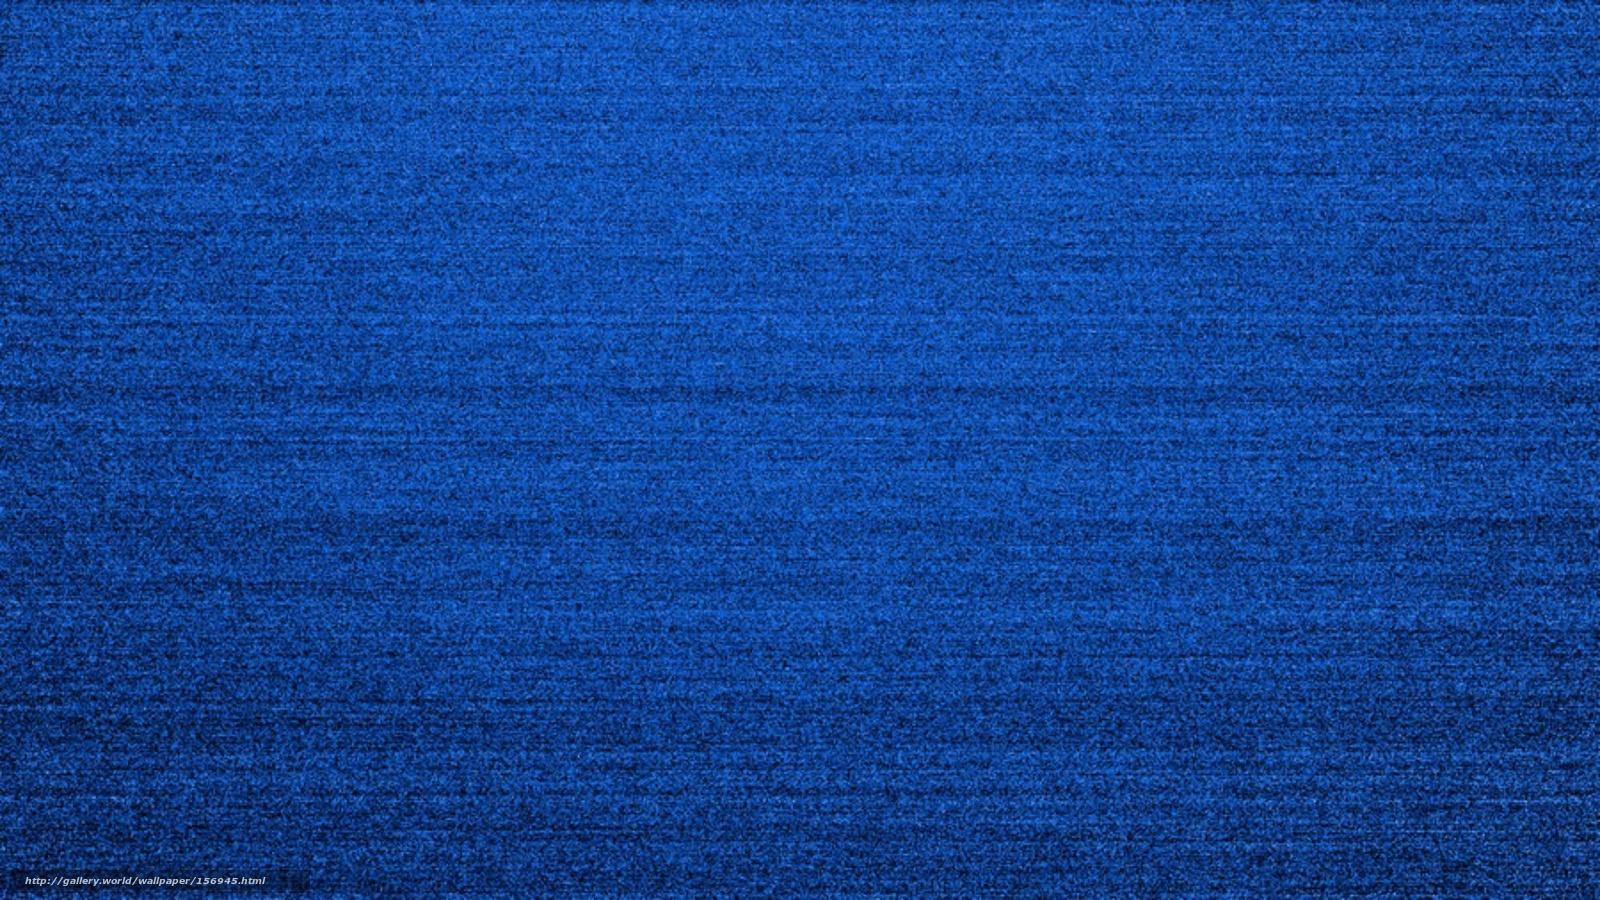 Descargar gratis patrones fondo alfombras azul fondos for Ikea alfombra azul